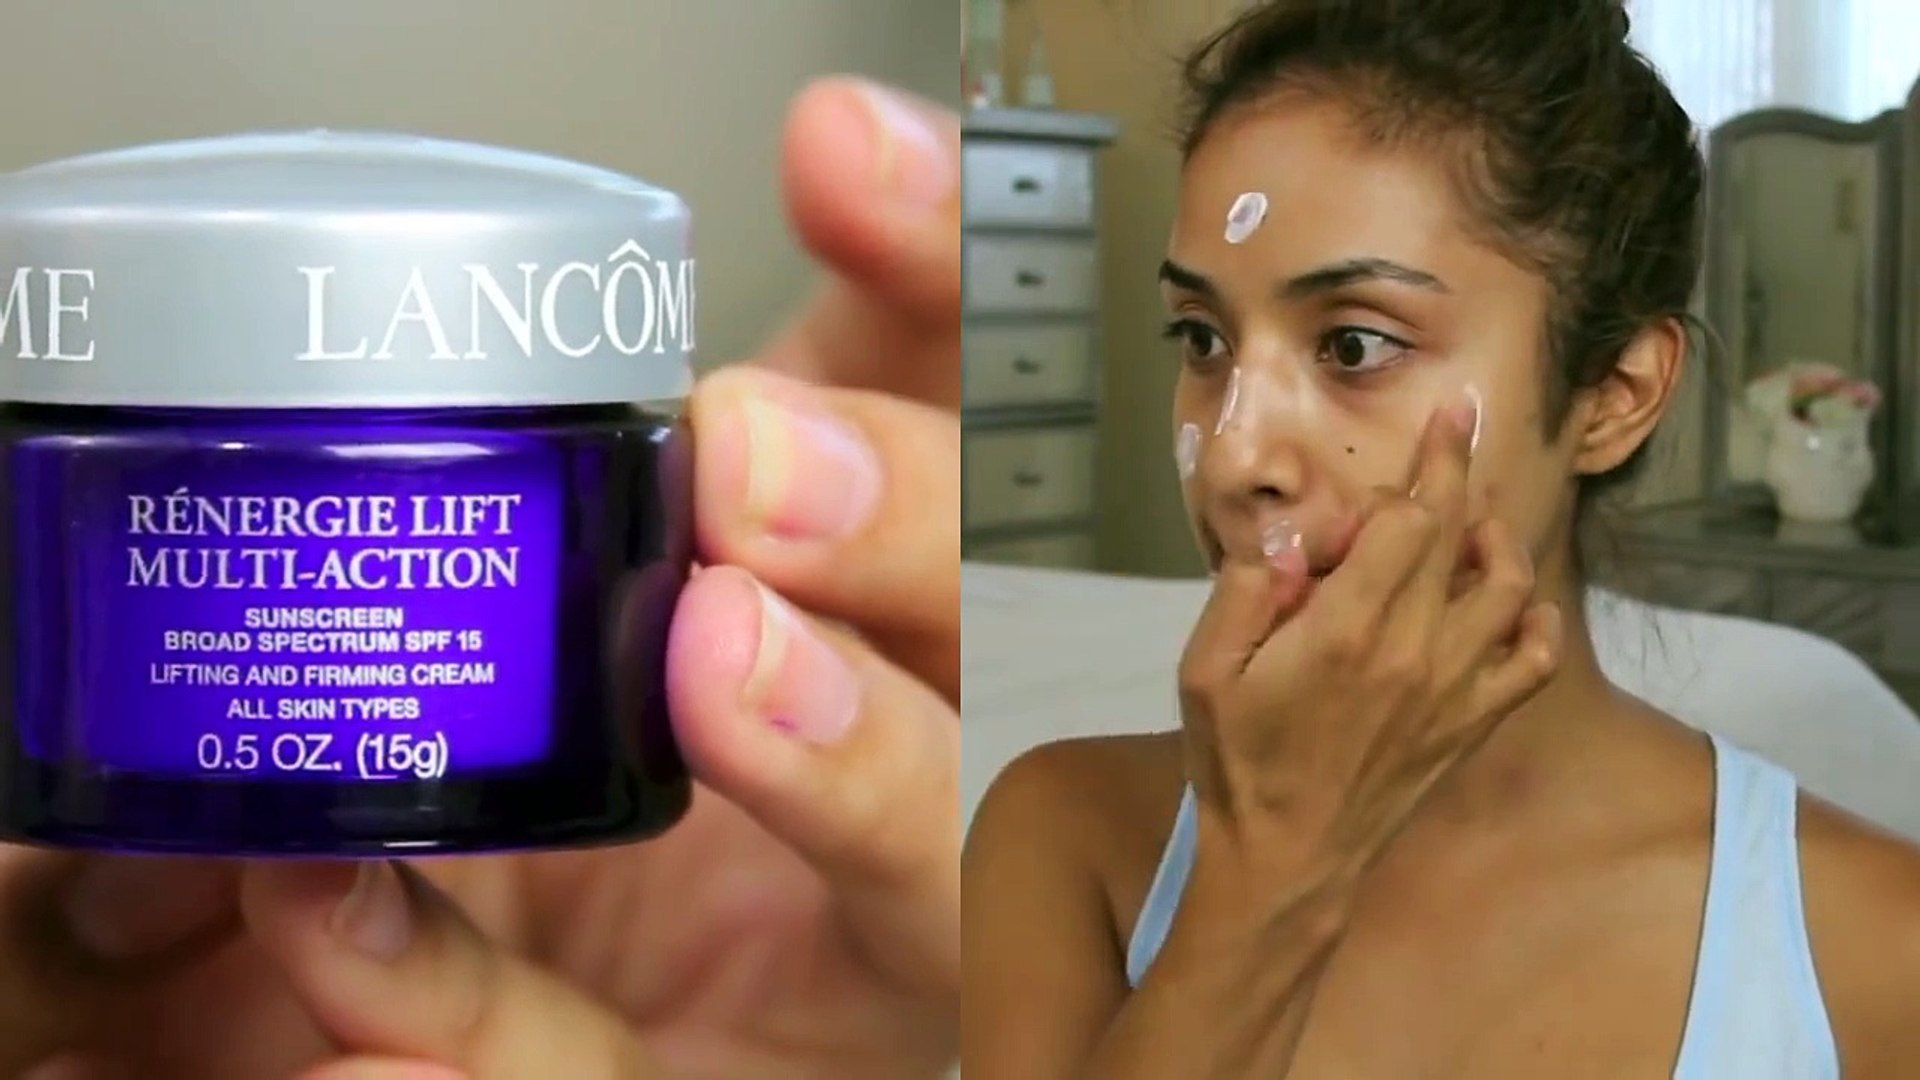 My Morning Skincare & Makeup Routine